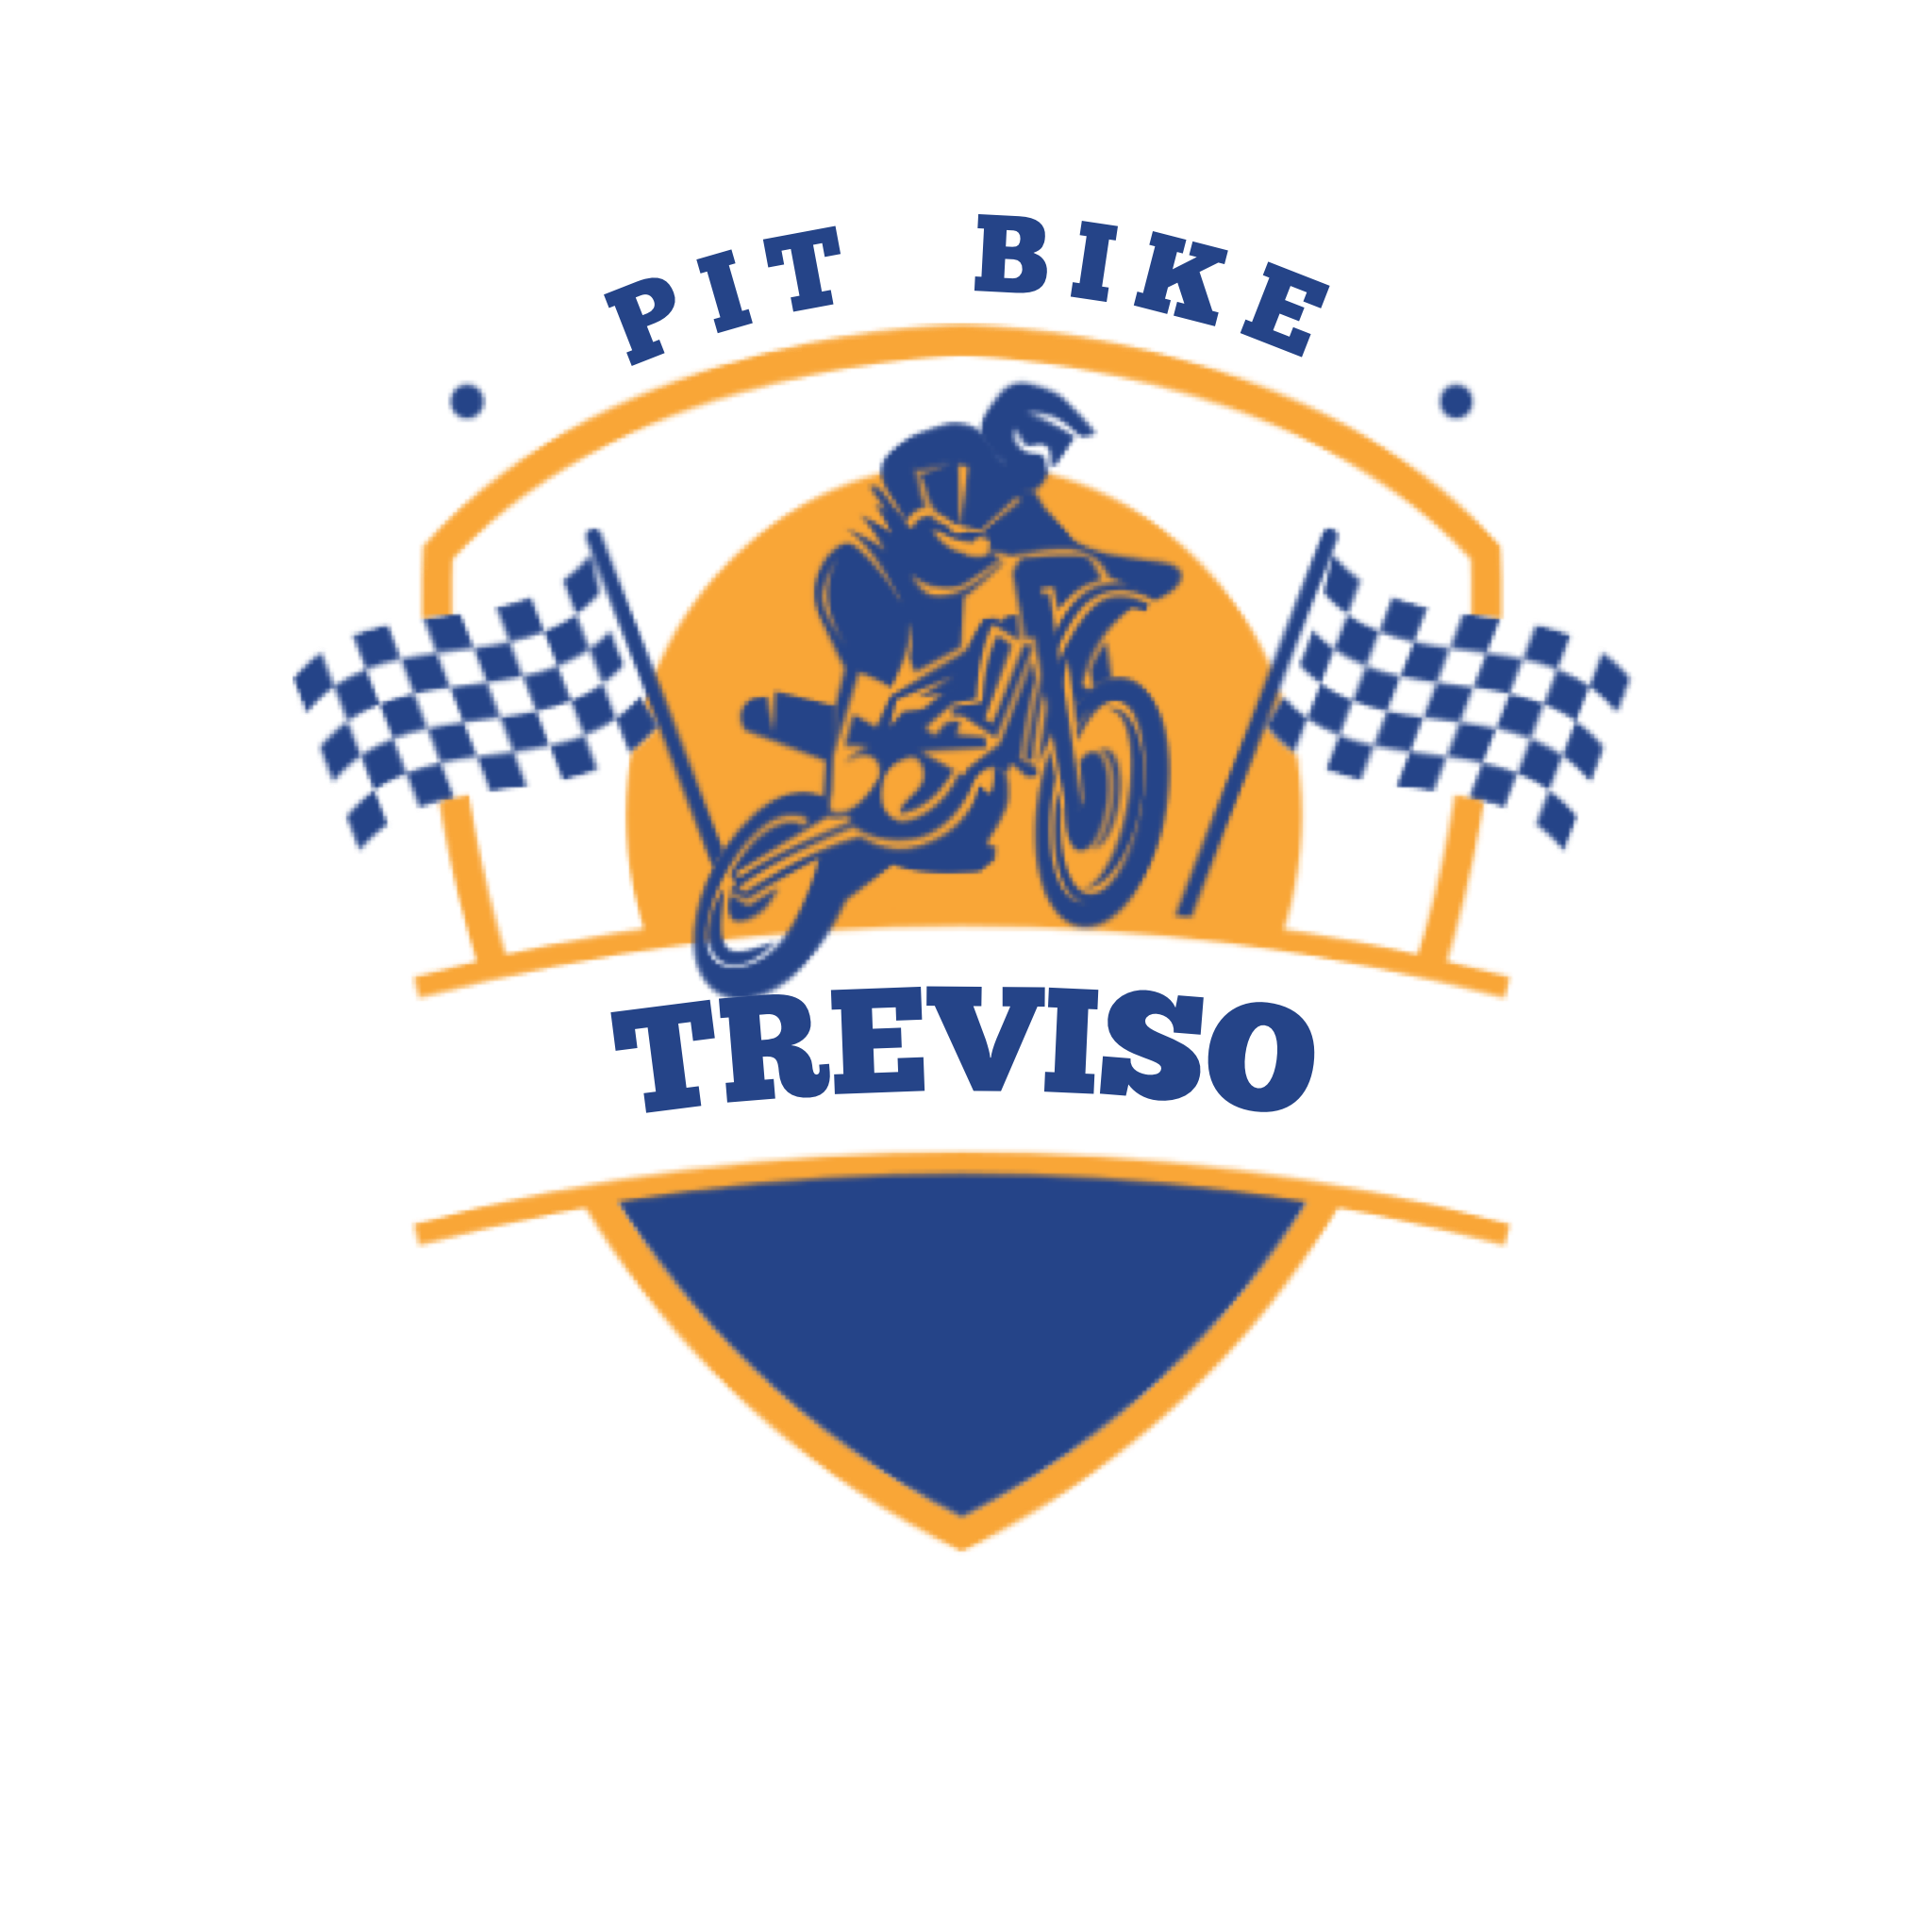 Pit Bike Treviso